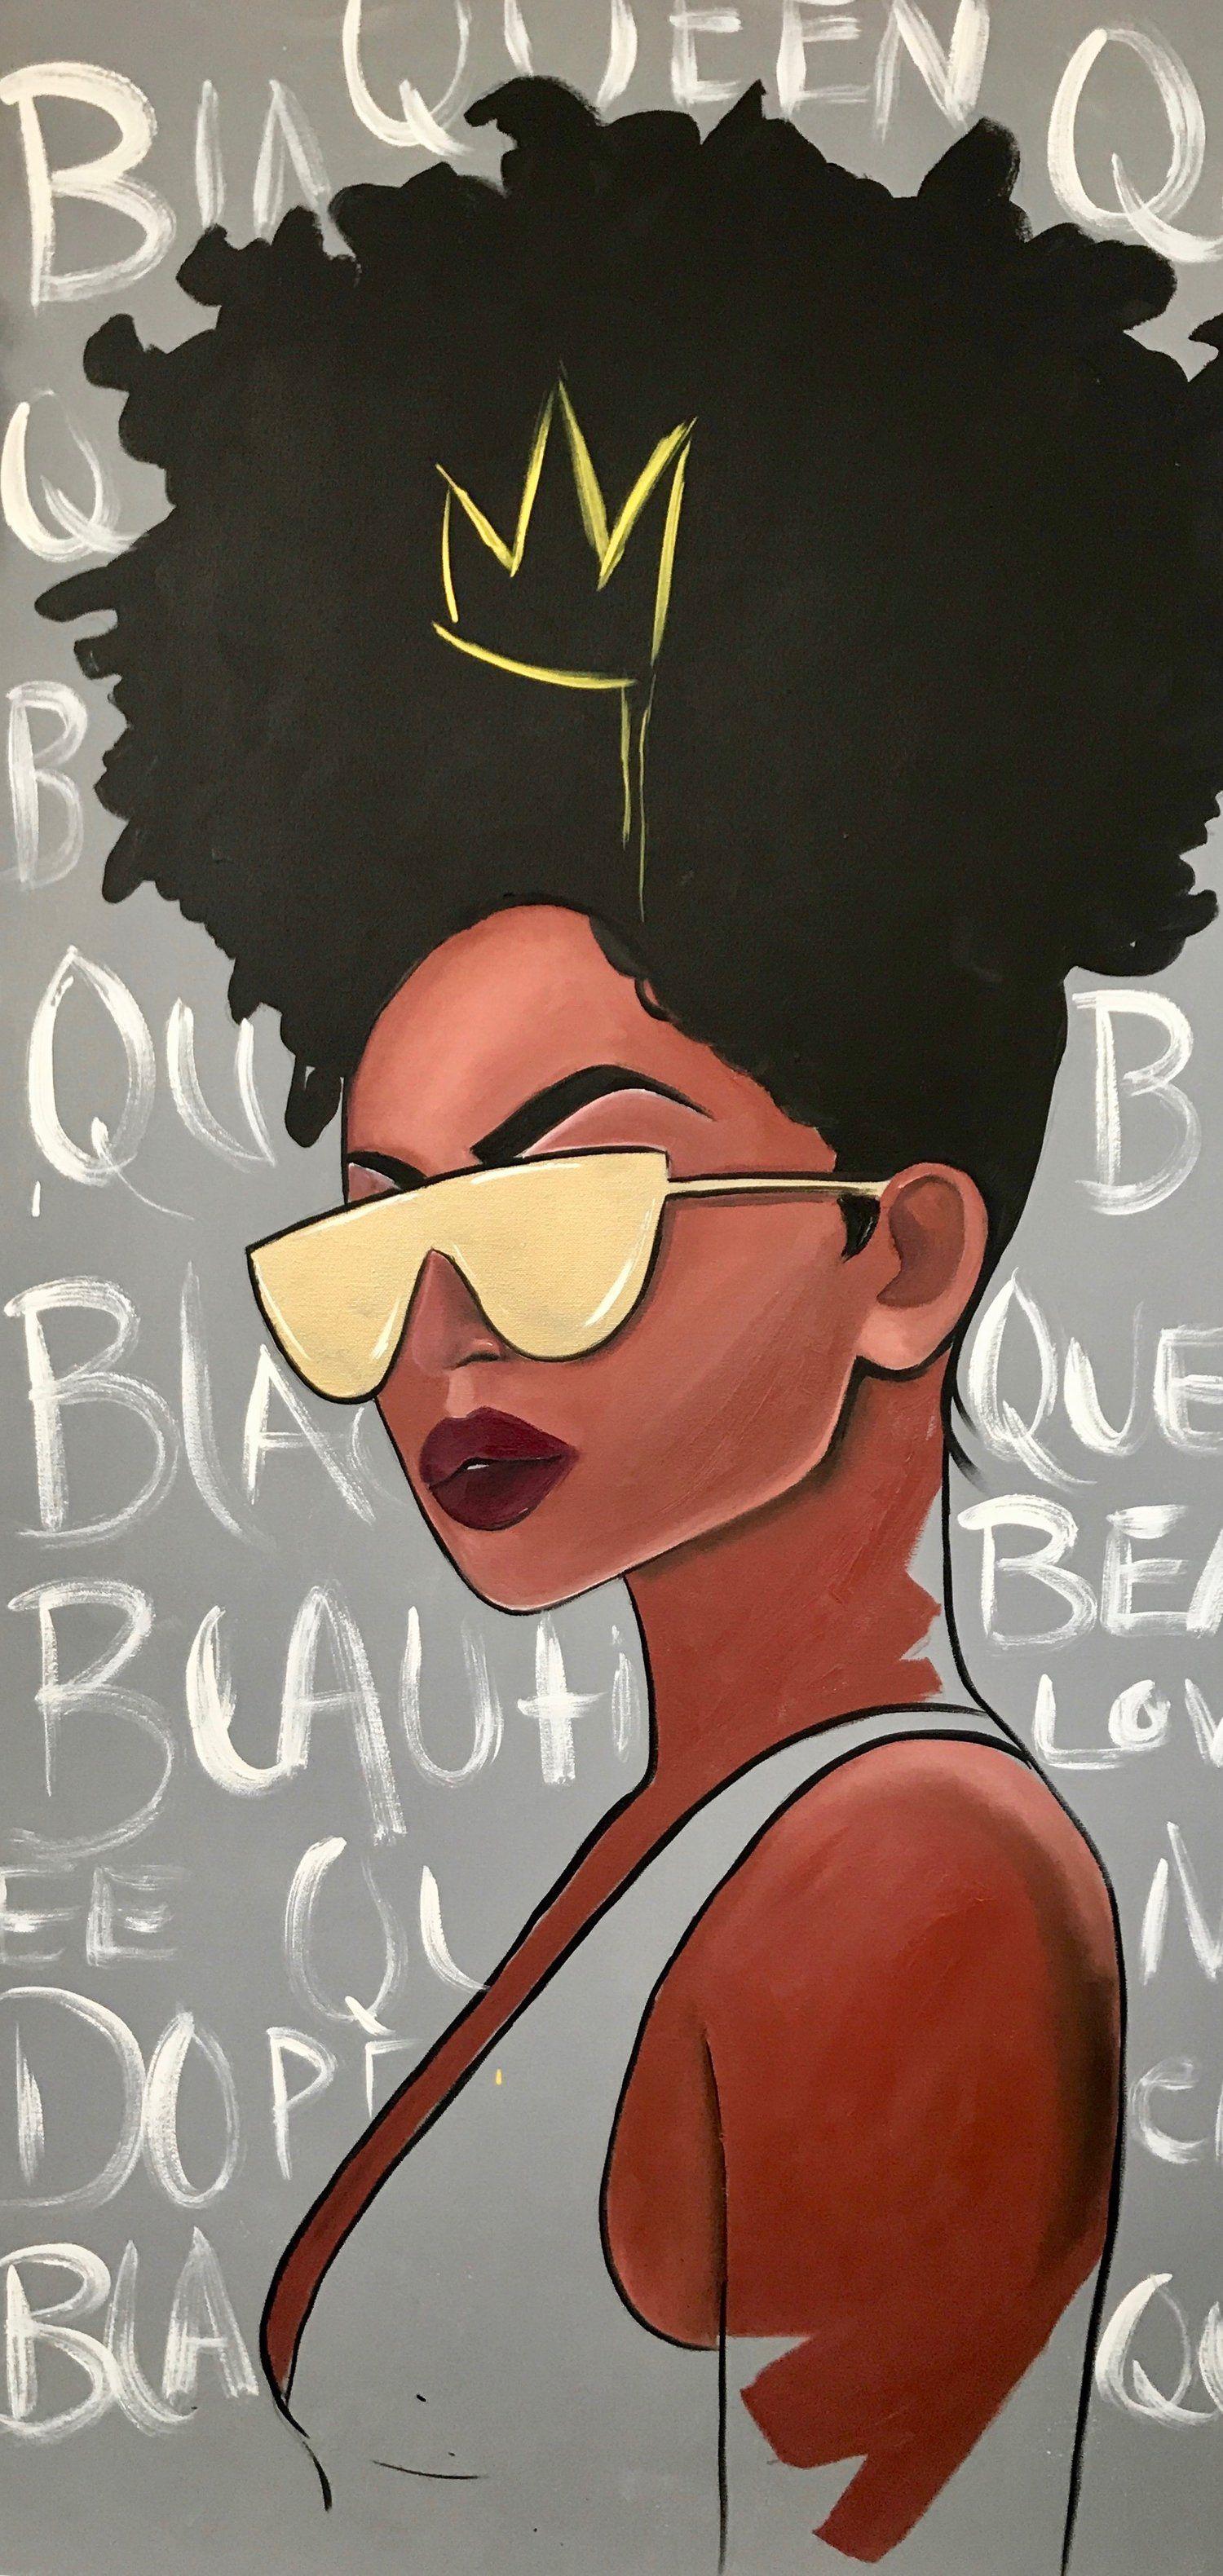 Black Queen Black Art Painting Black Girl Magic Art Black Love Art